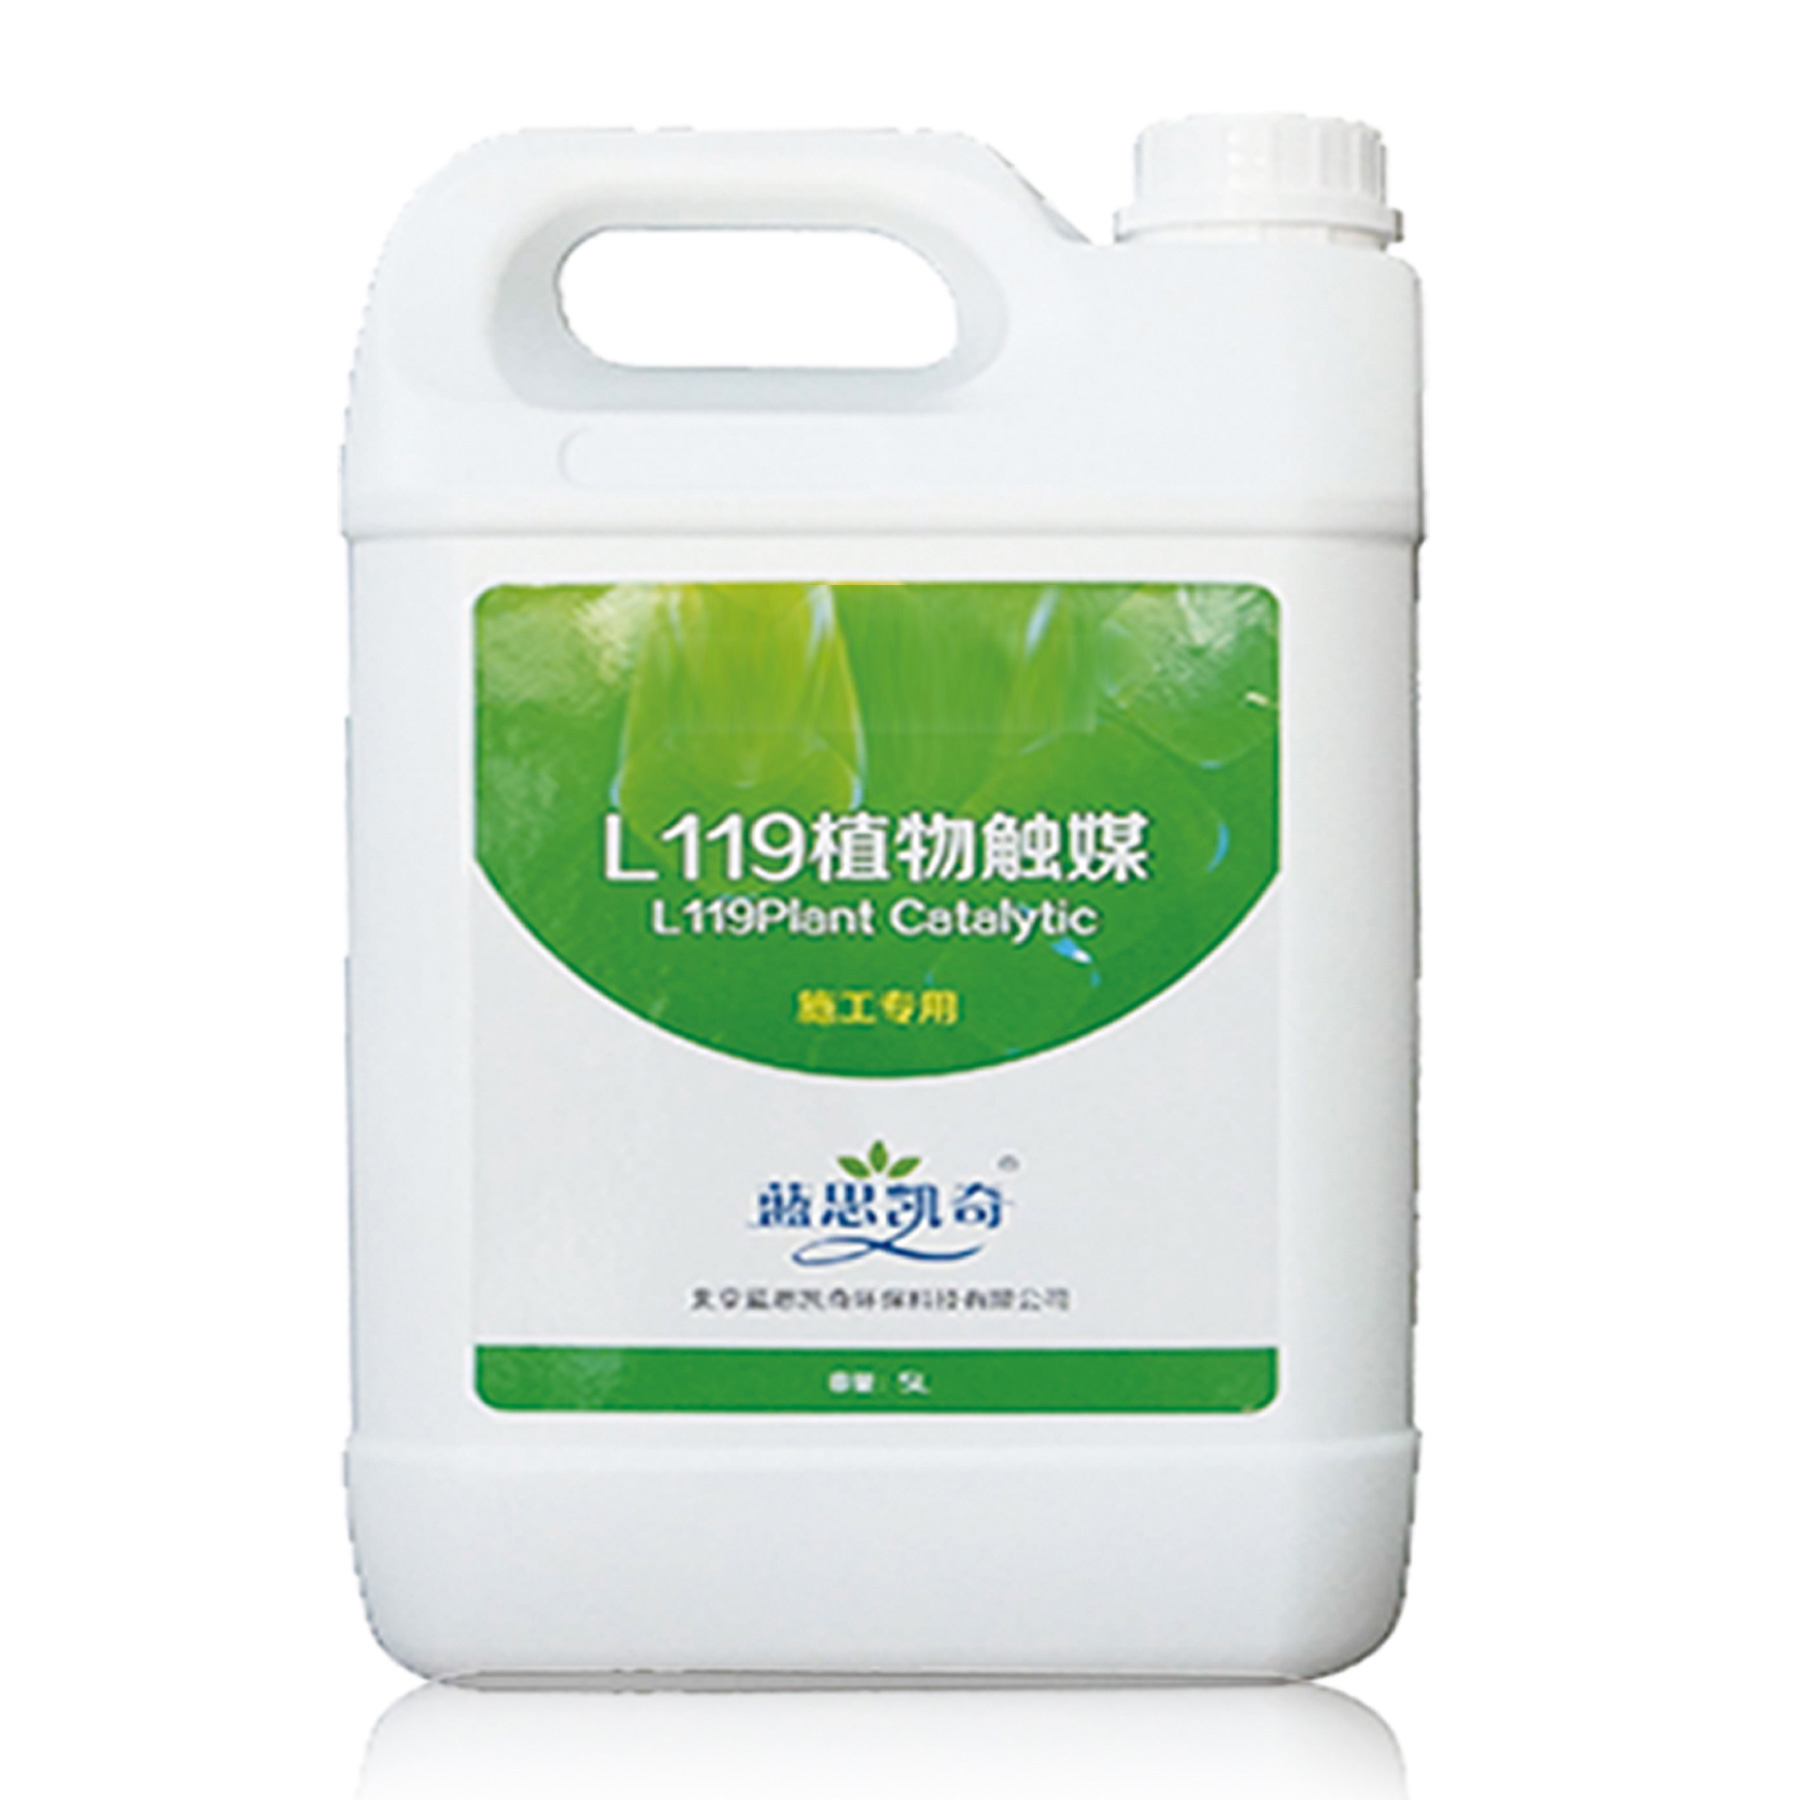 <b>L119纯植物去味剂</b>